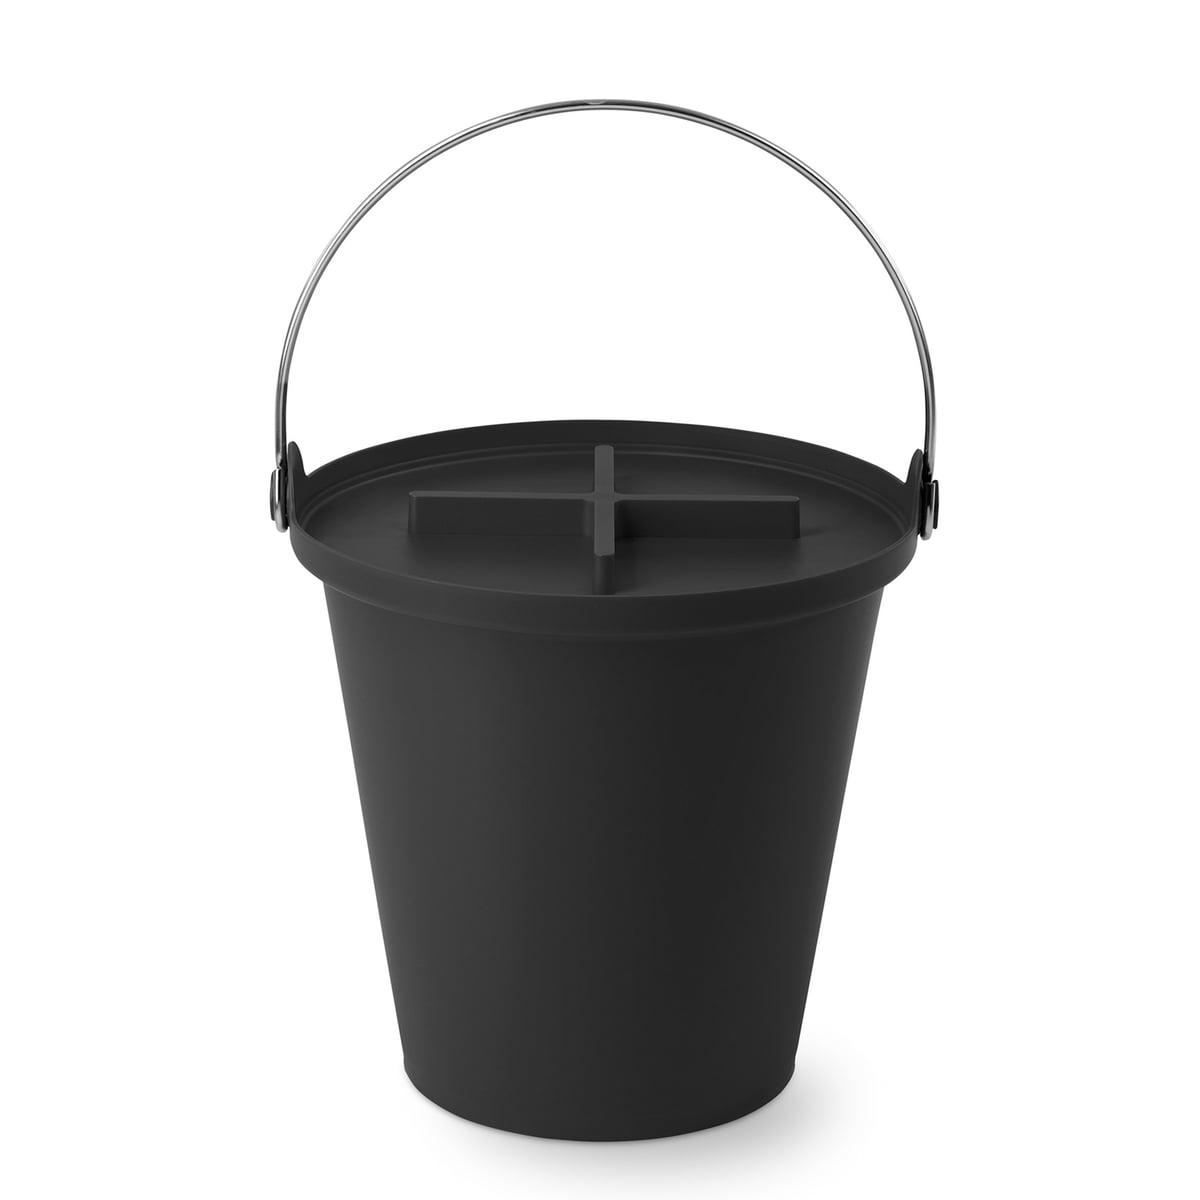 H2O Eimer + Deckel, schwarz / Metall